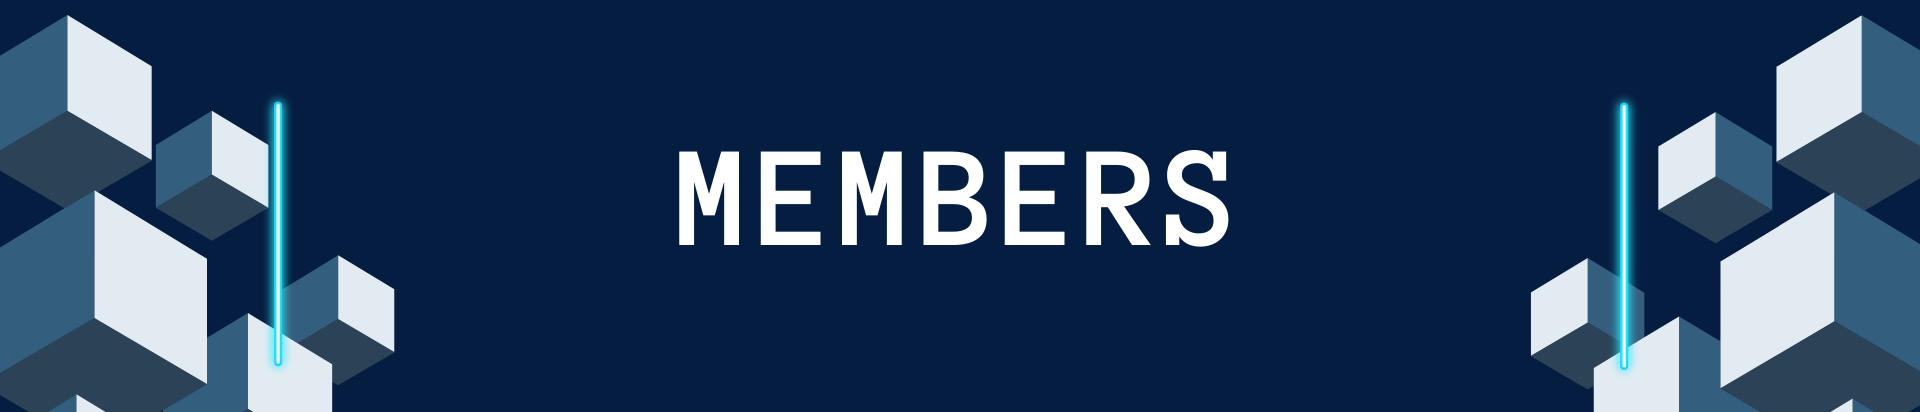 members-header